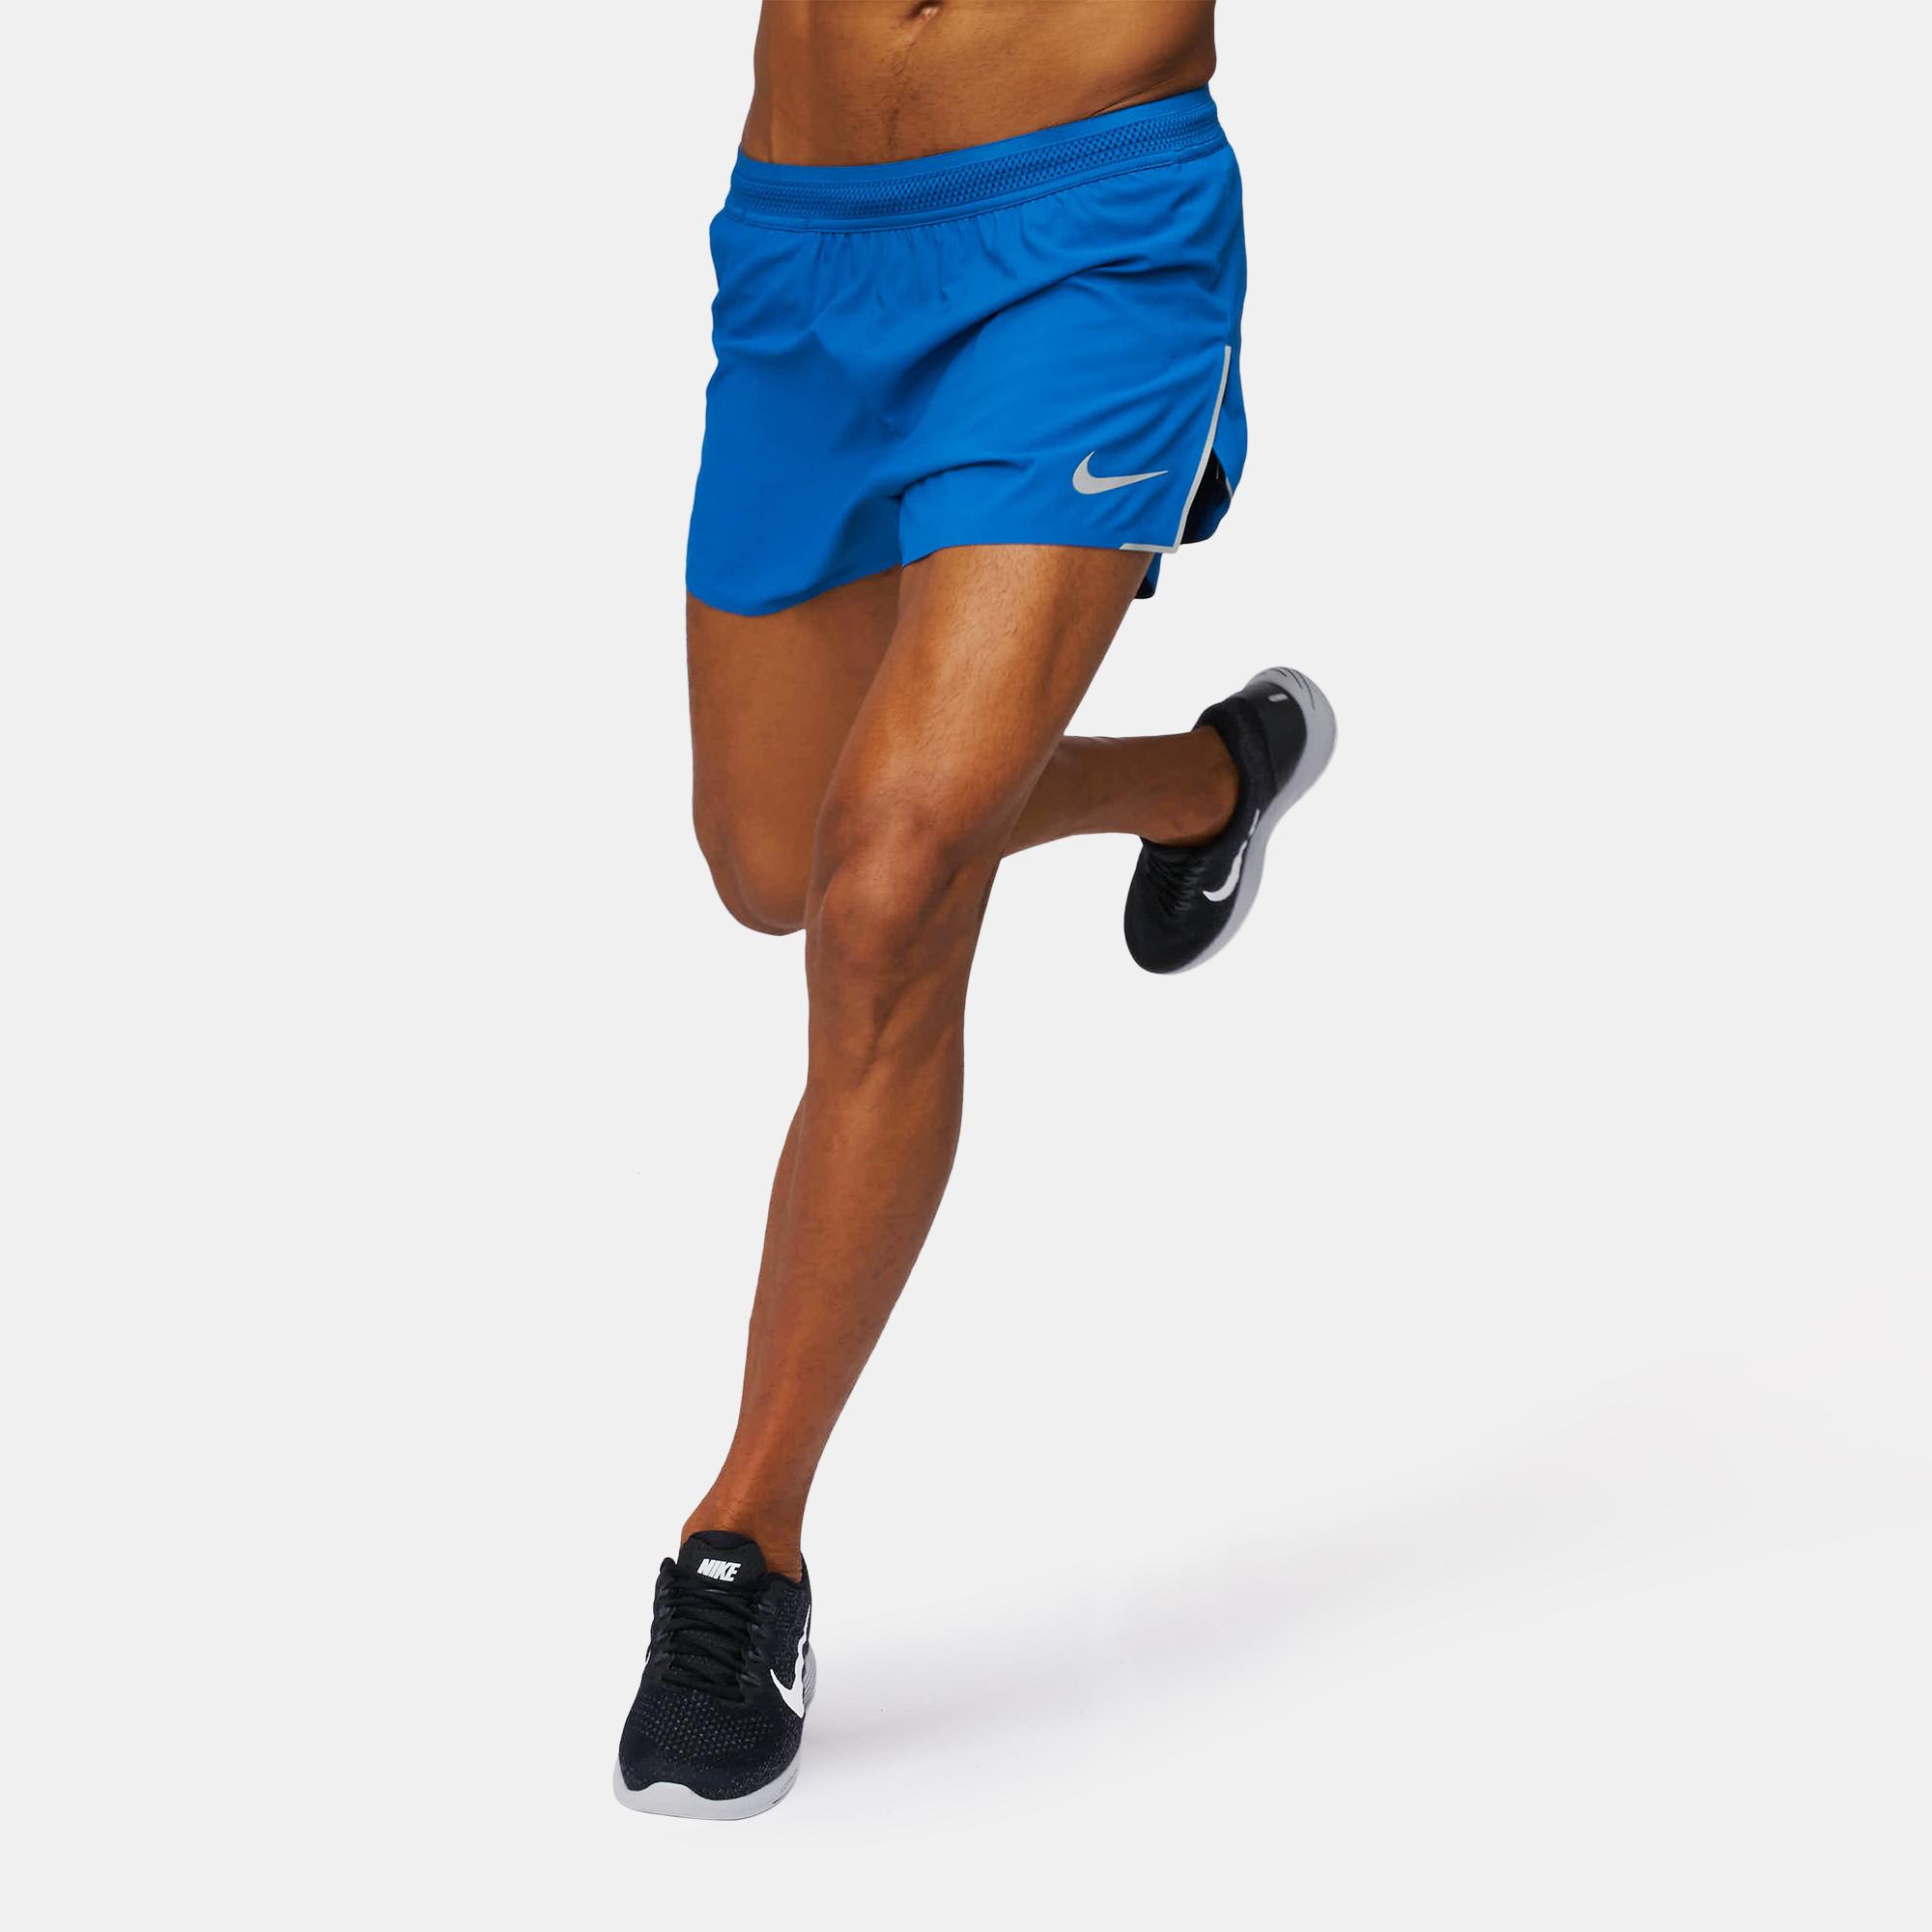 "7daf7cf1502ac2 Shop Blue Nike AeroSwift 4"" Running Shorts for Mens by Nike"